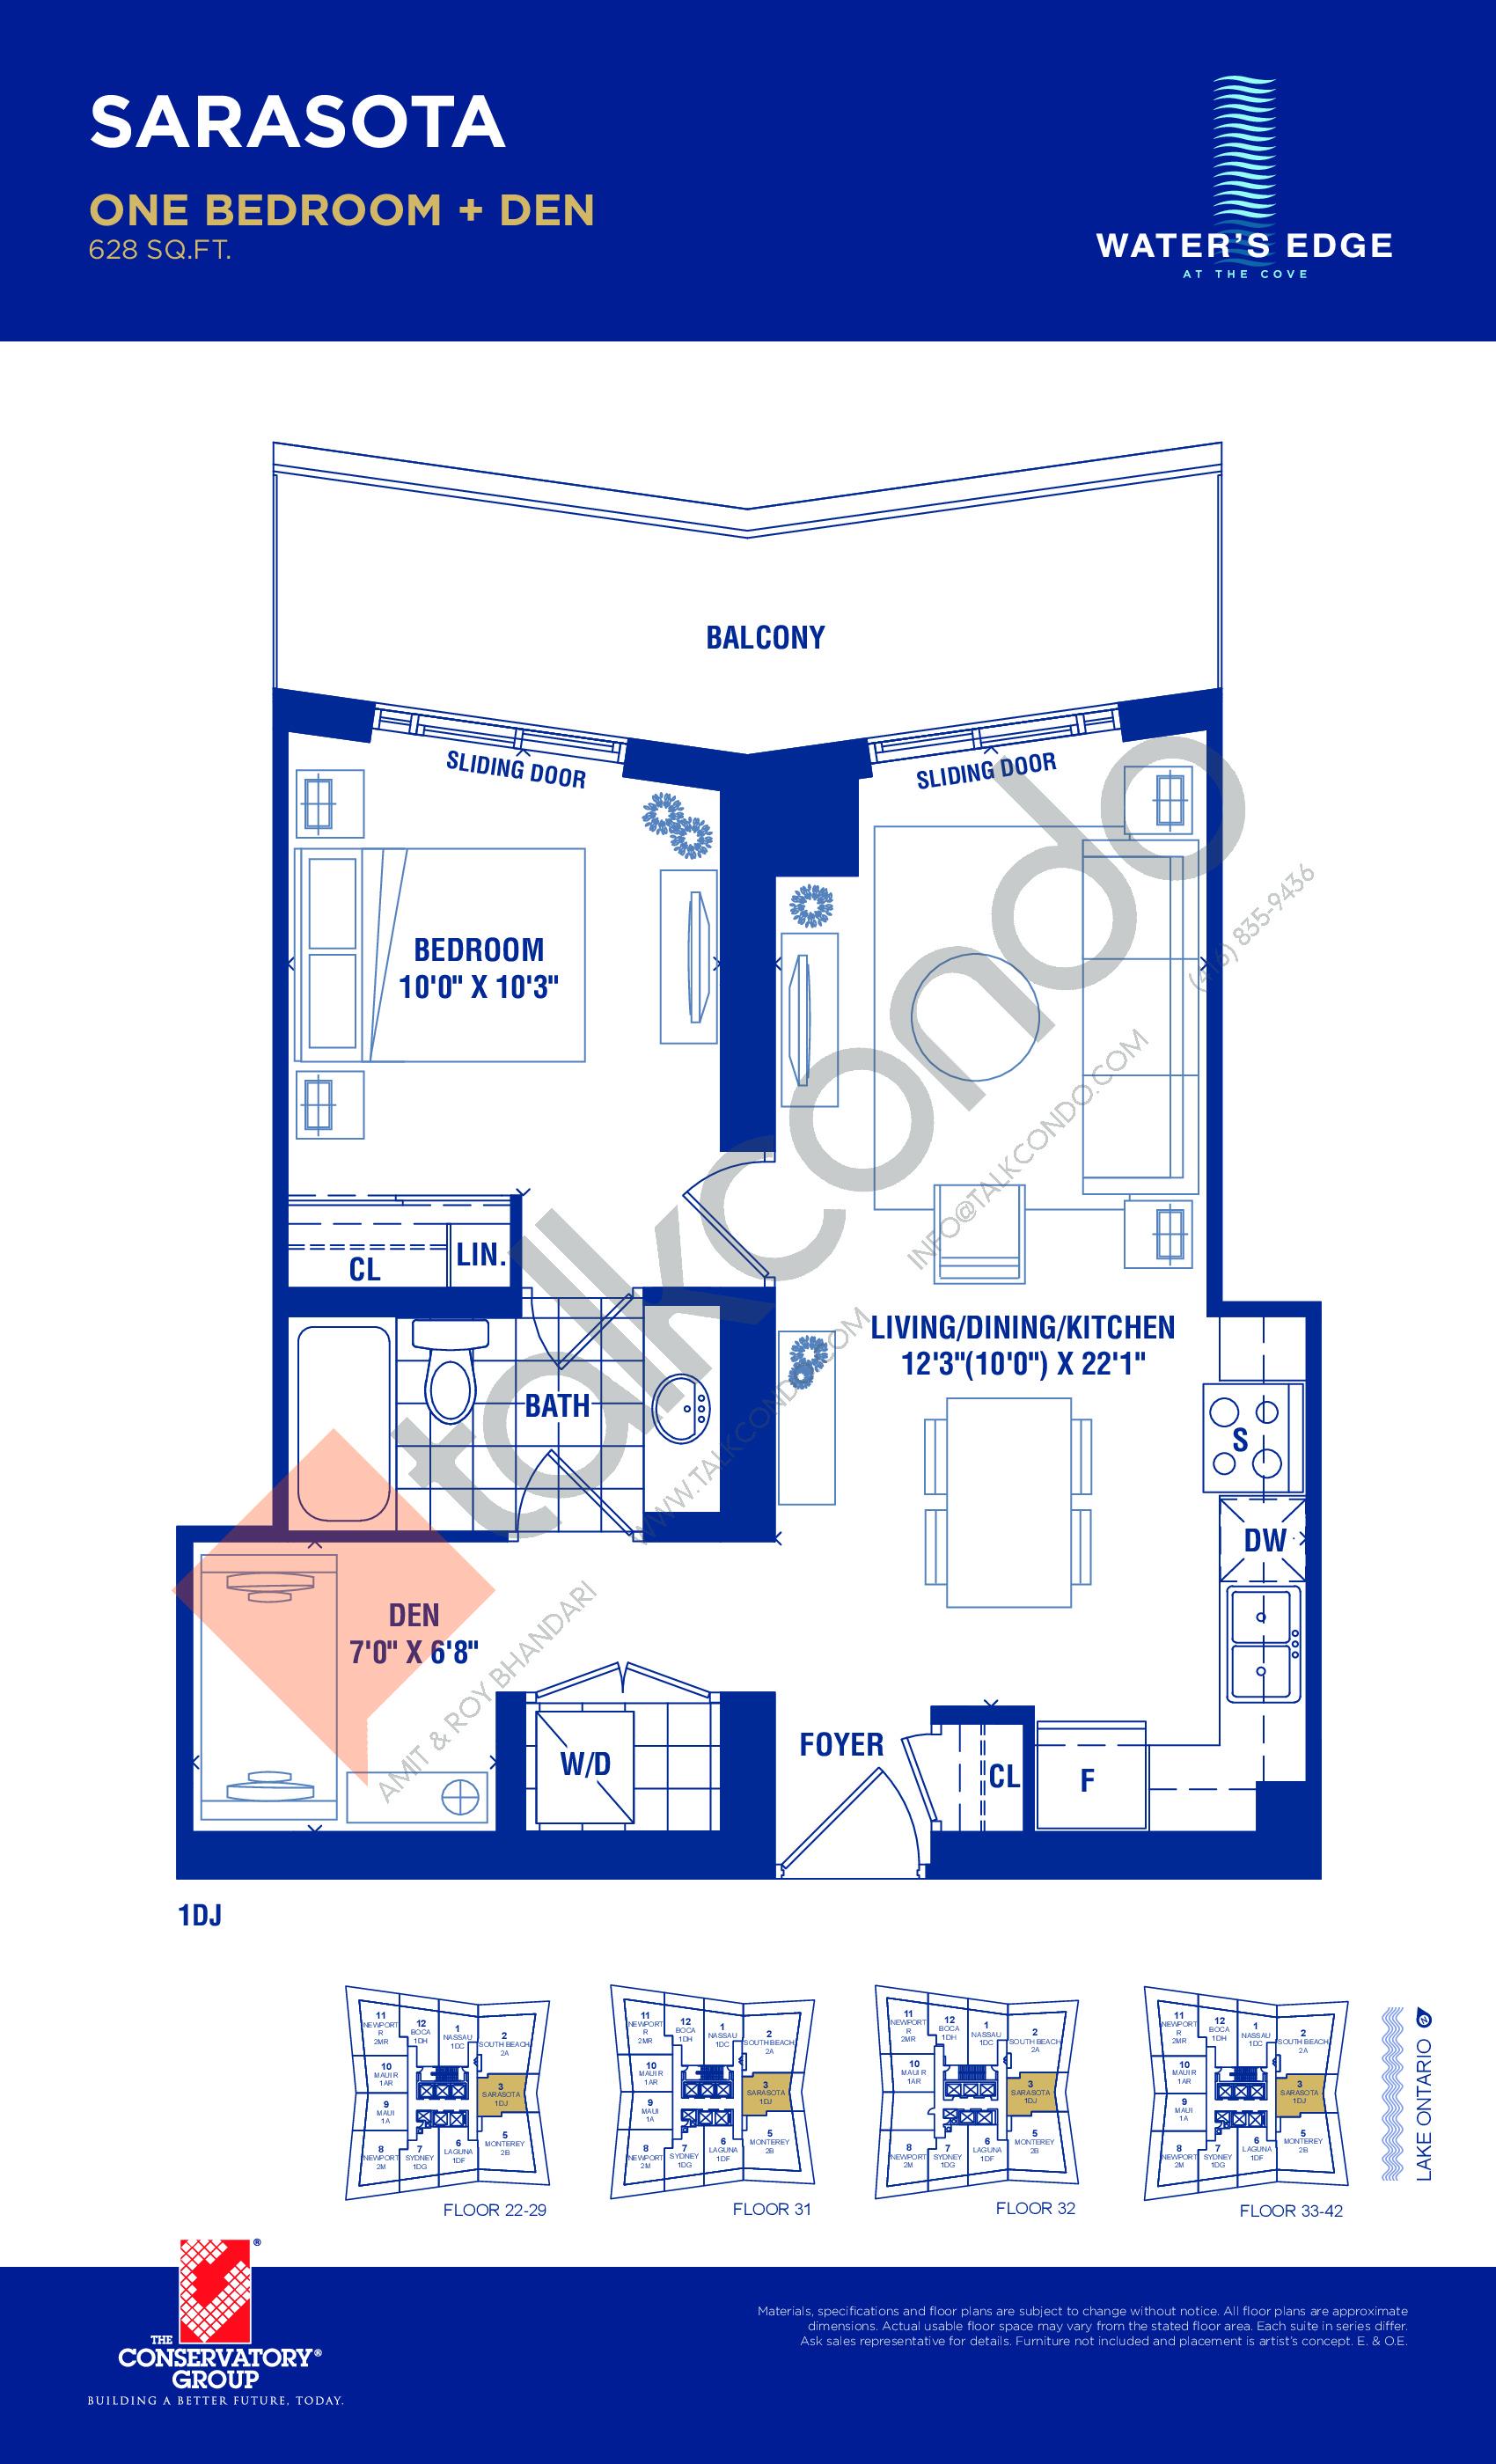 Sarasota Floor Plan at Water's Edge at the Cove Condos - 628 sq.ft